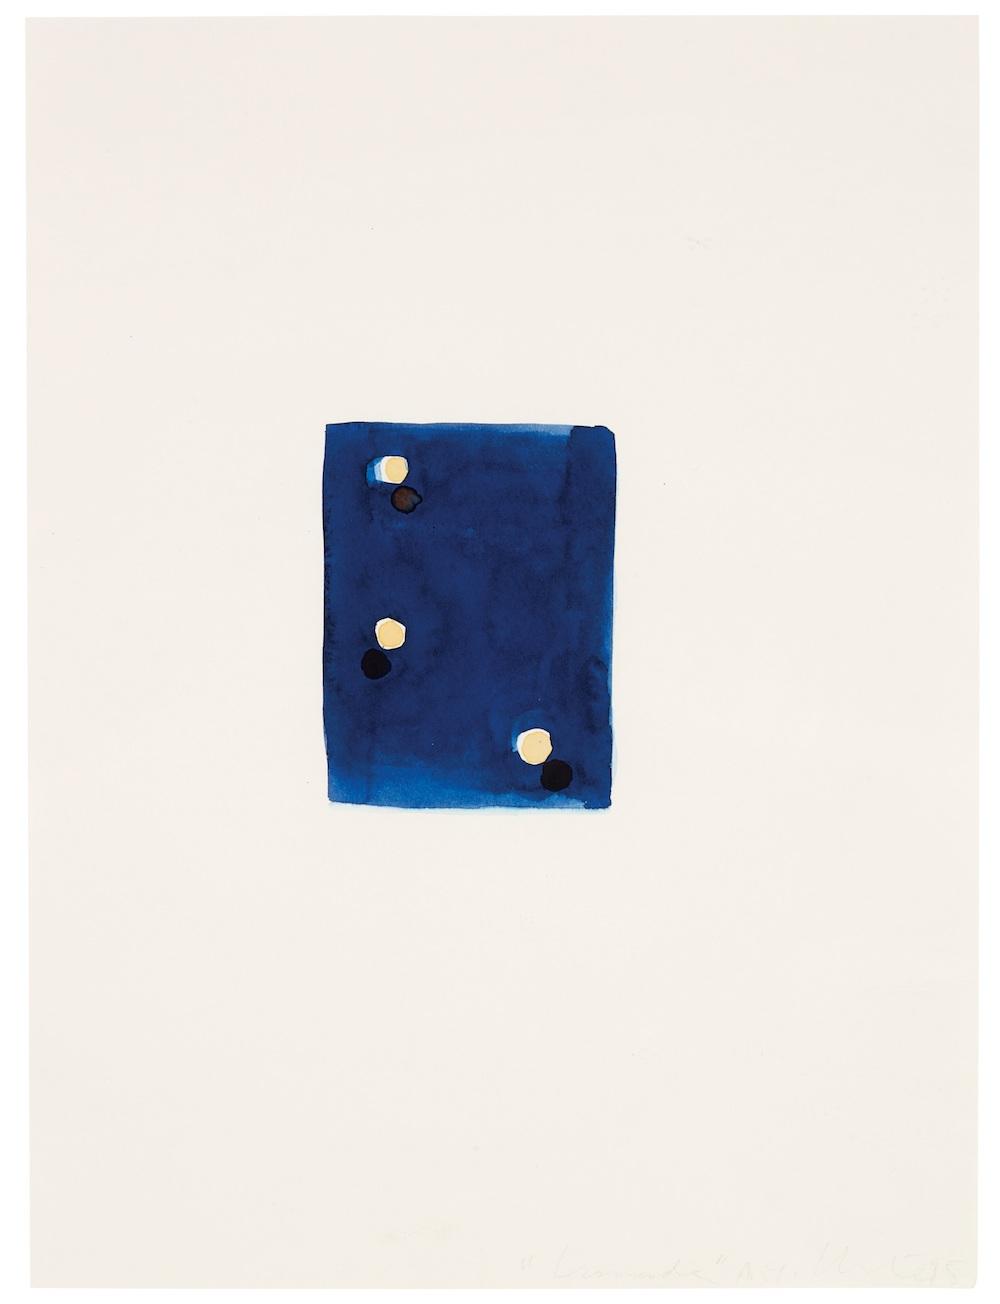 Juan Usle Lunada, Prix Guerlain 2020